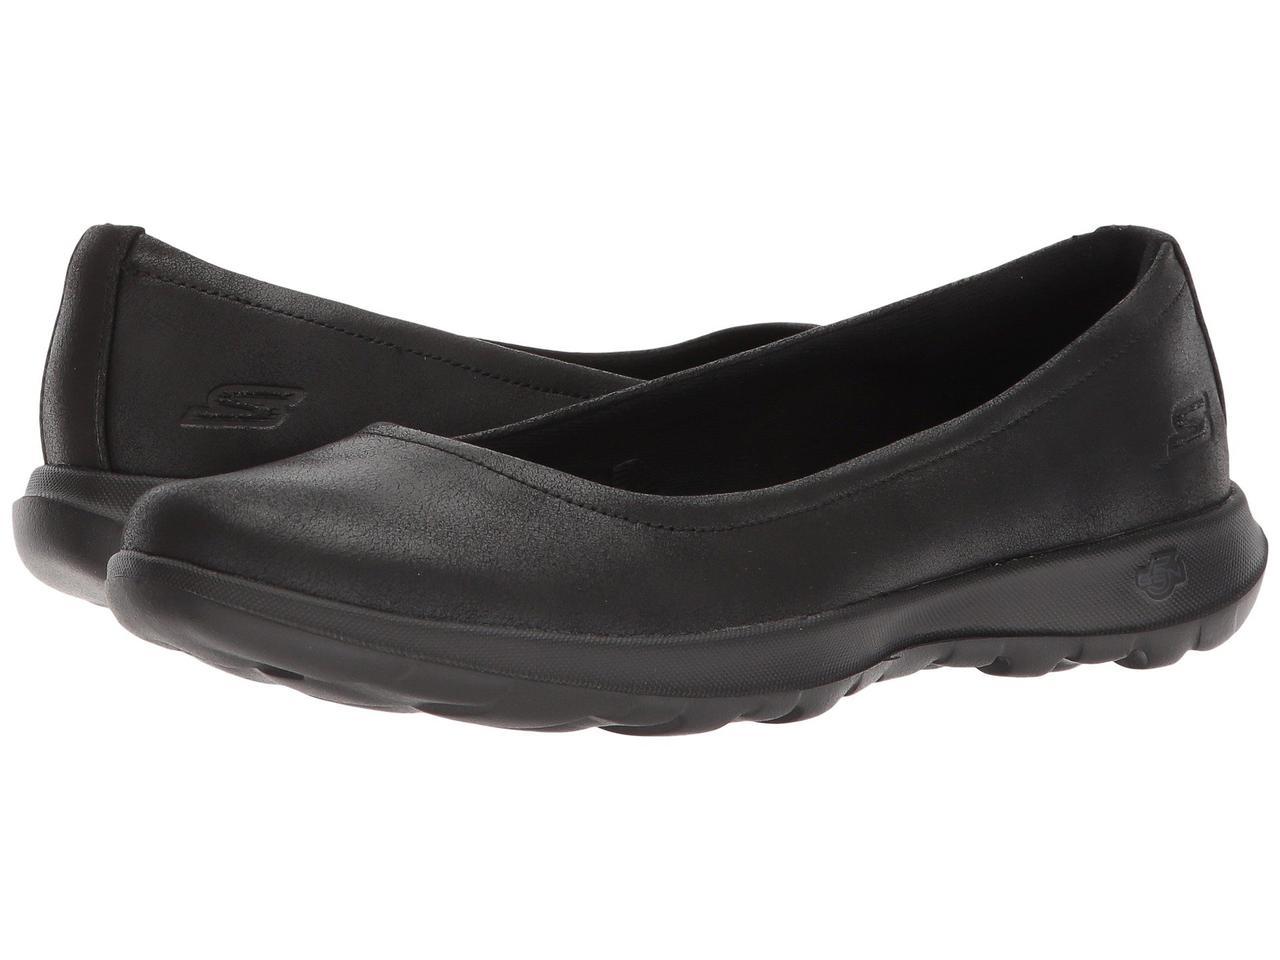 Туфли без каблука (Оригинал) SKECHERS Performance Go Walk Lite - Gem Black